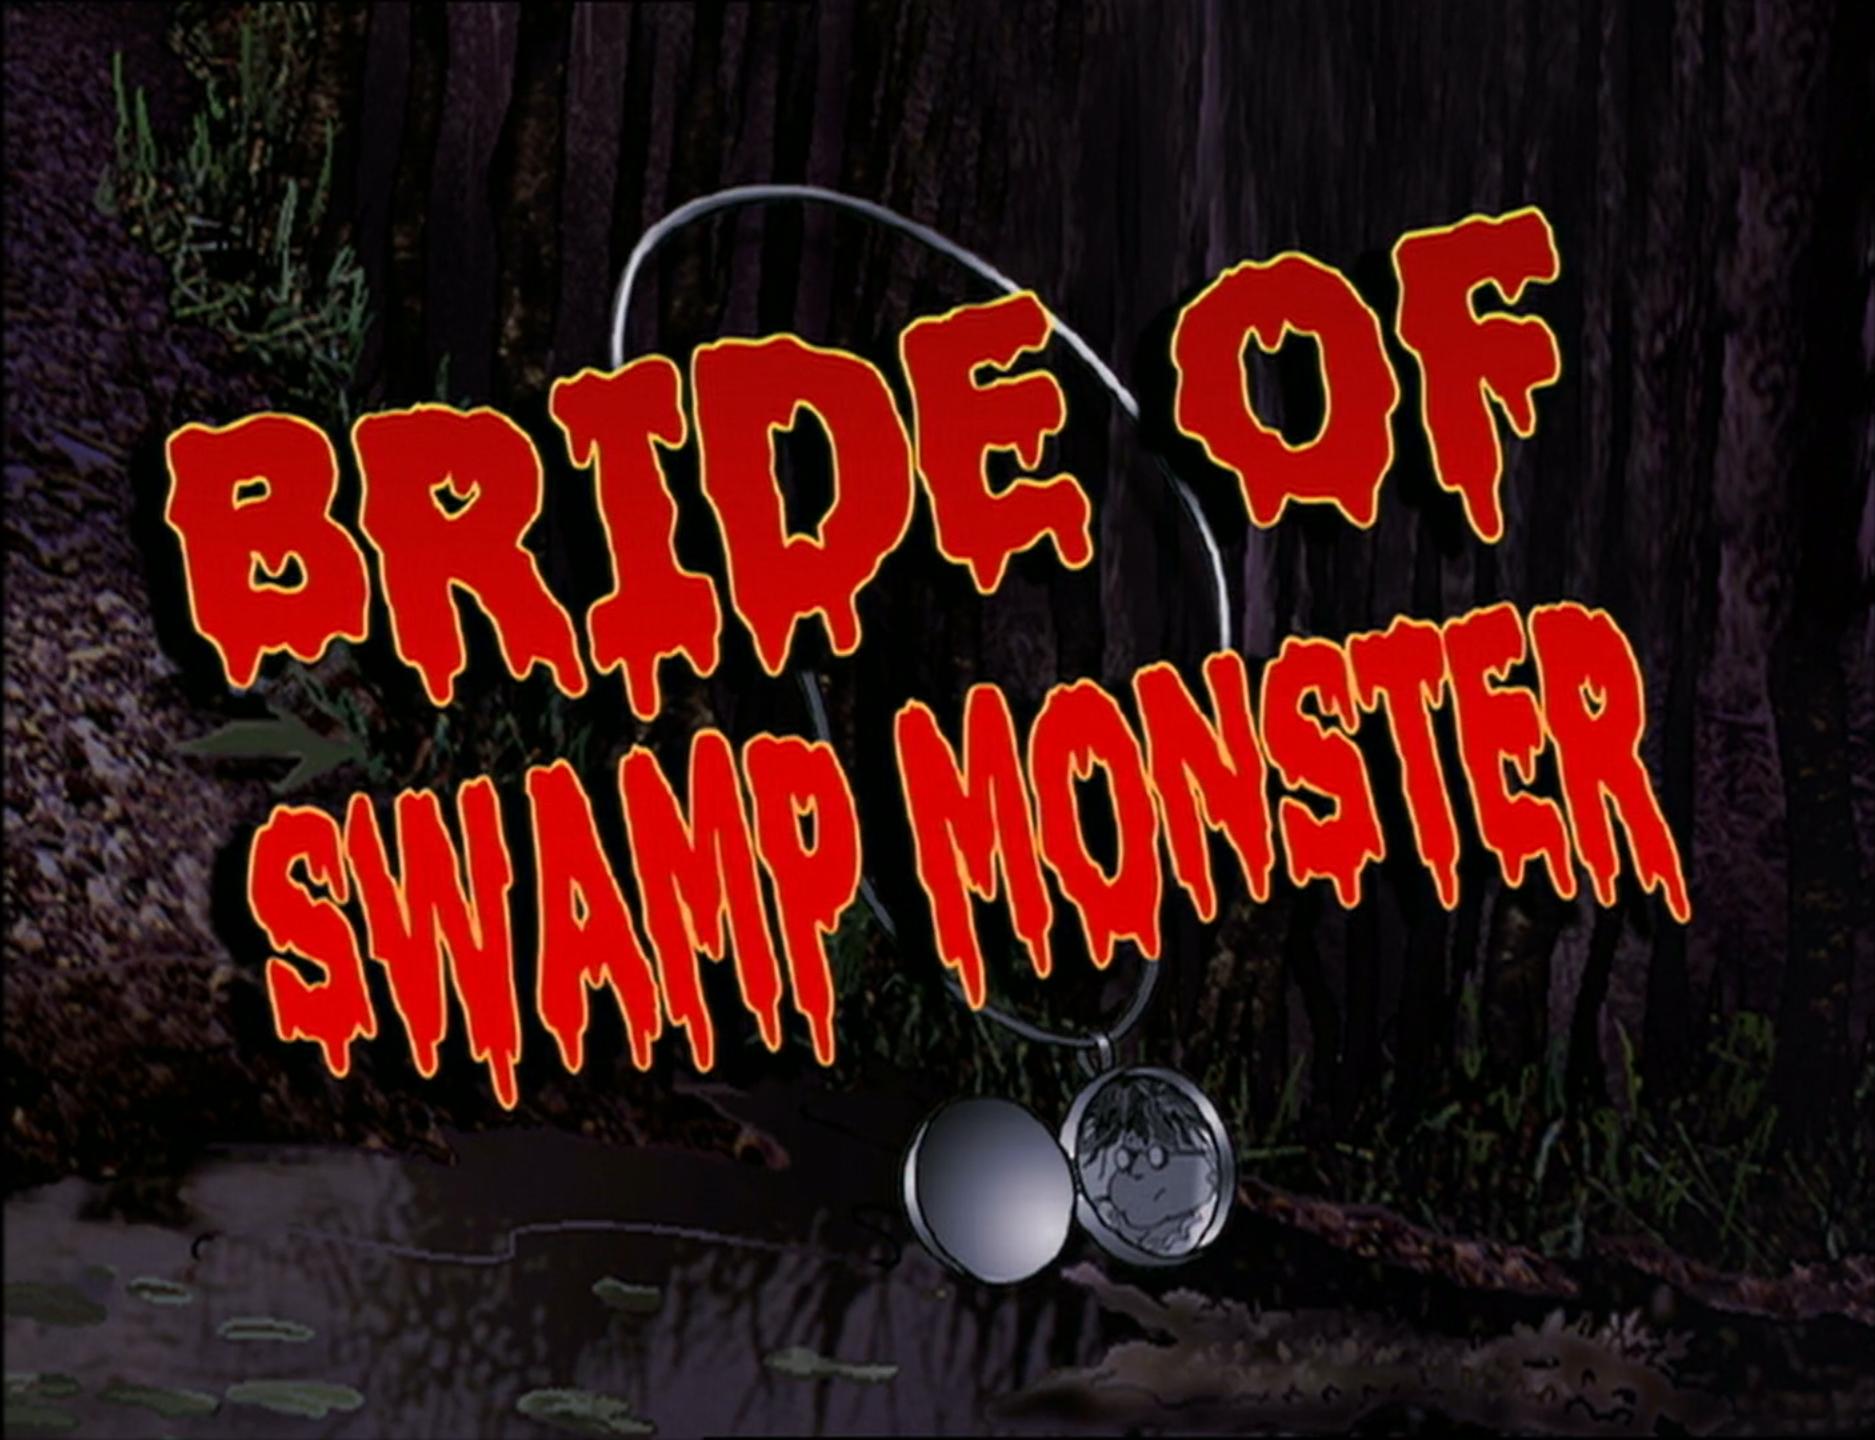 File:Titlecard-405a-Bride of Swamp Monster.png